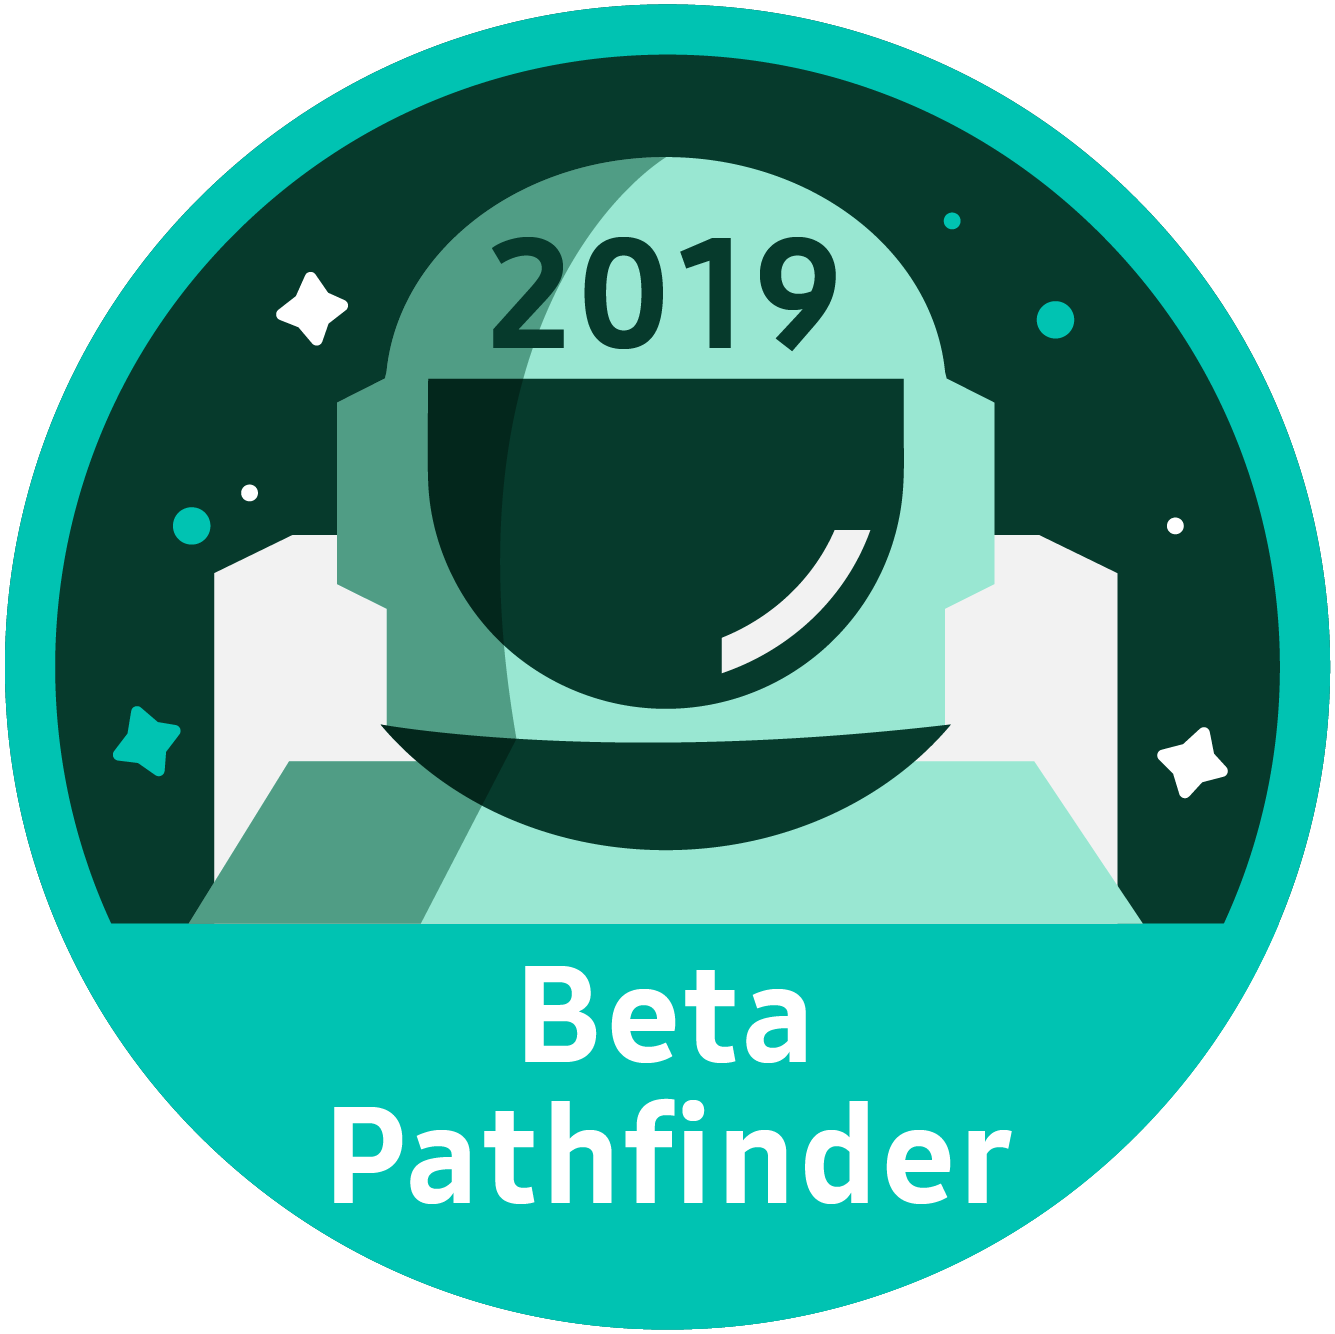 Beta Pathfinder 2019